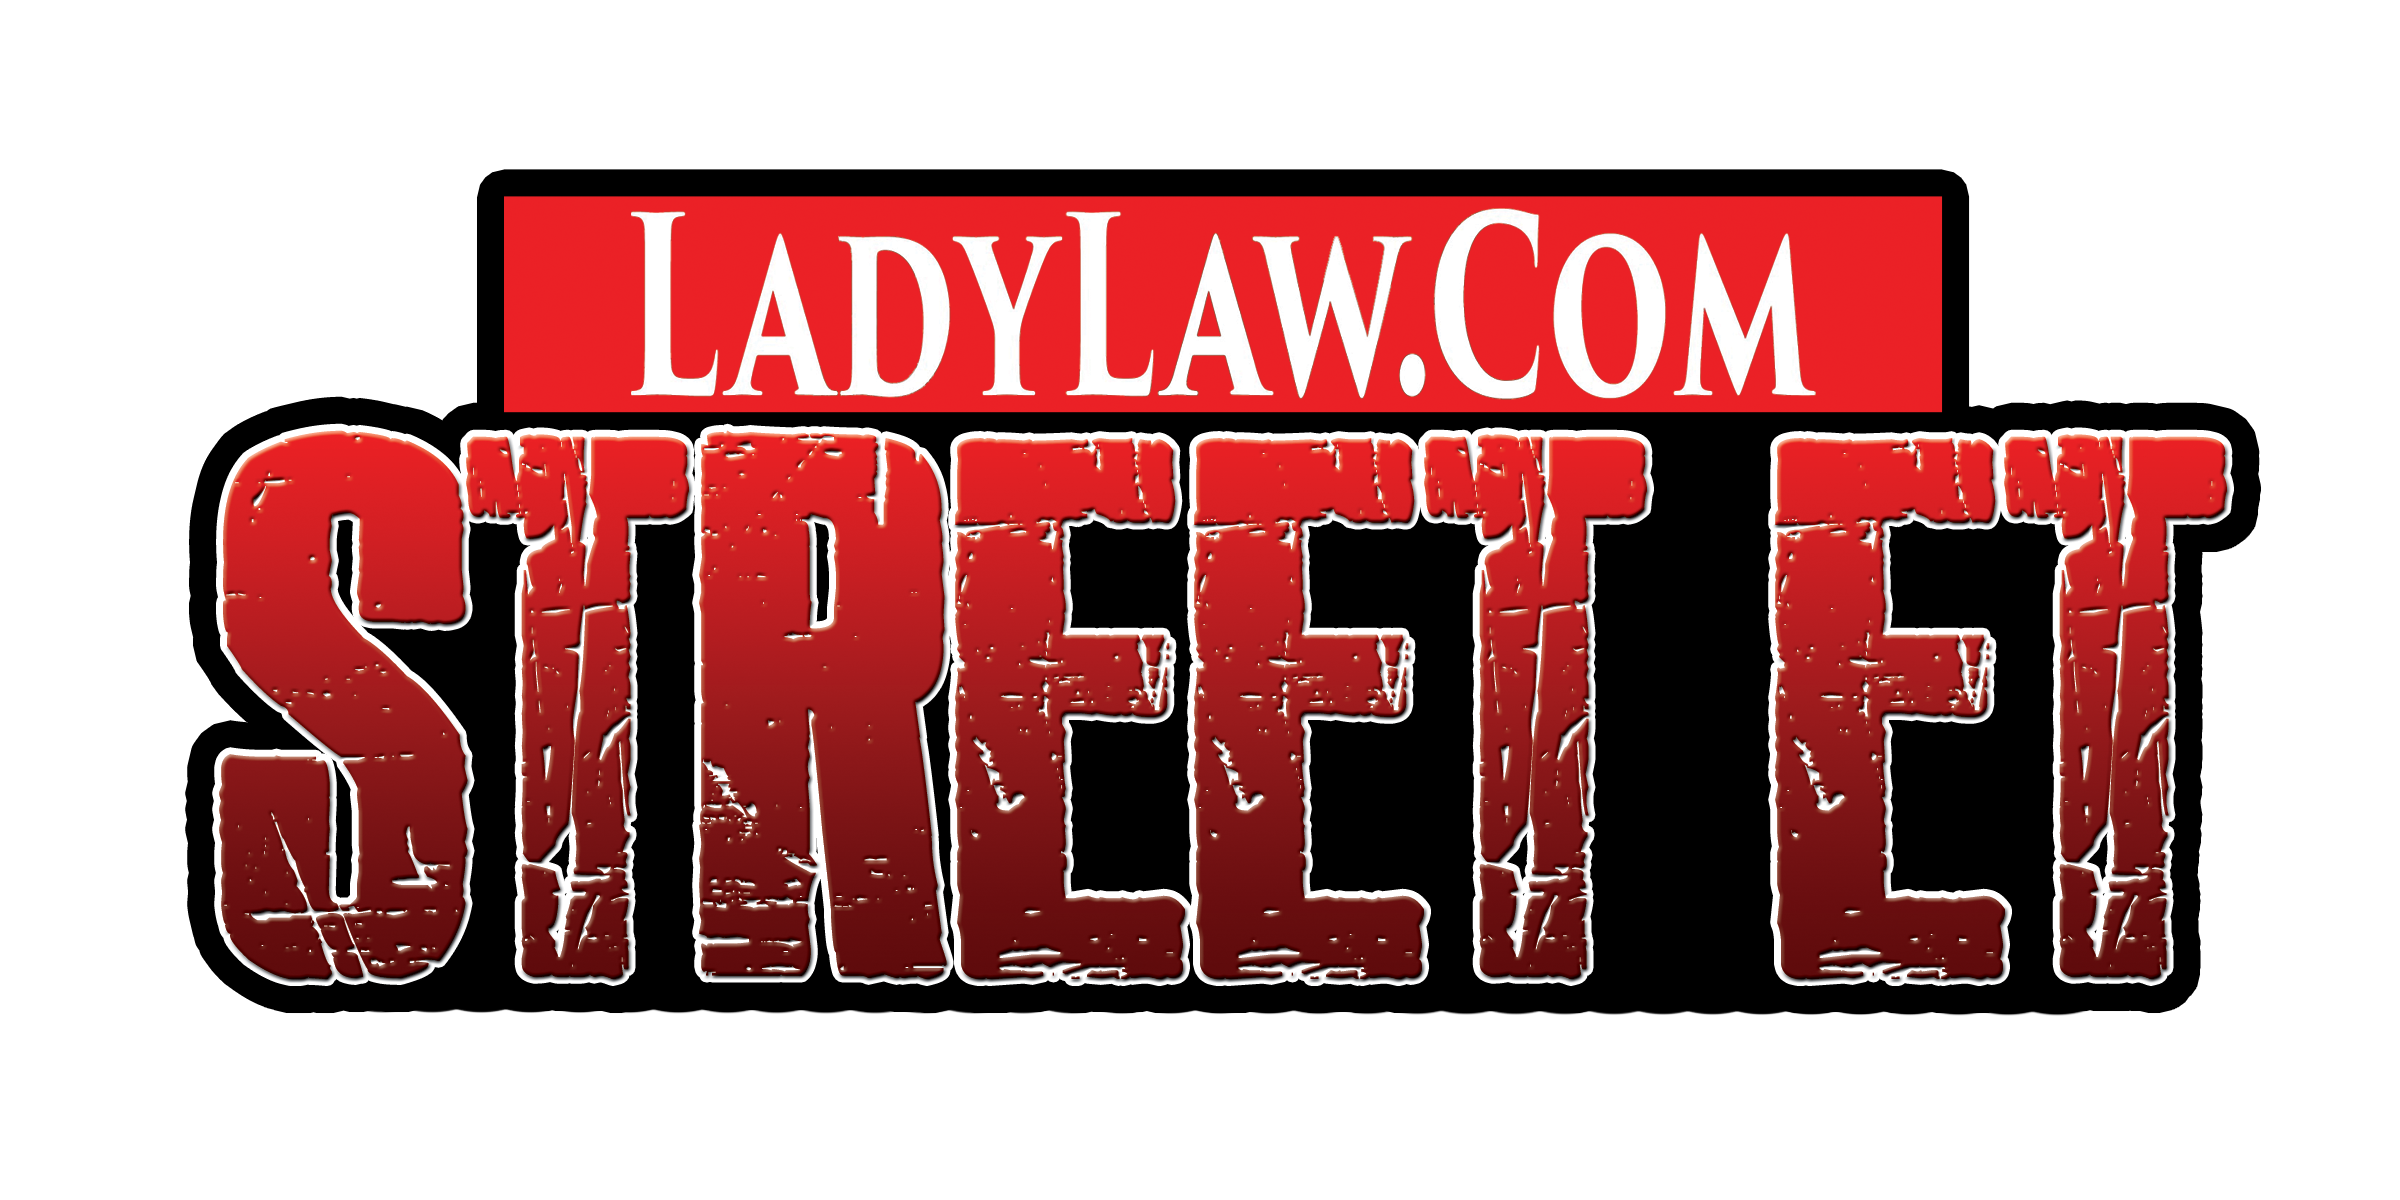 LadyLaw.Com Street ET Logo